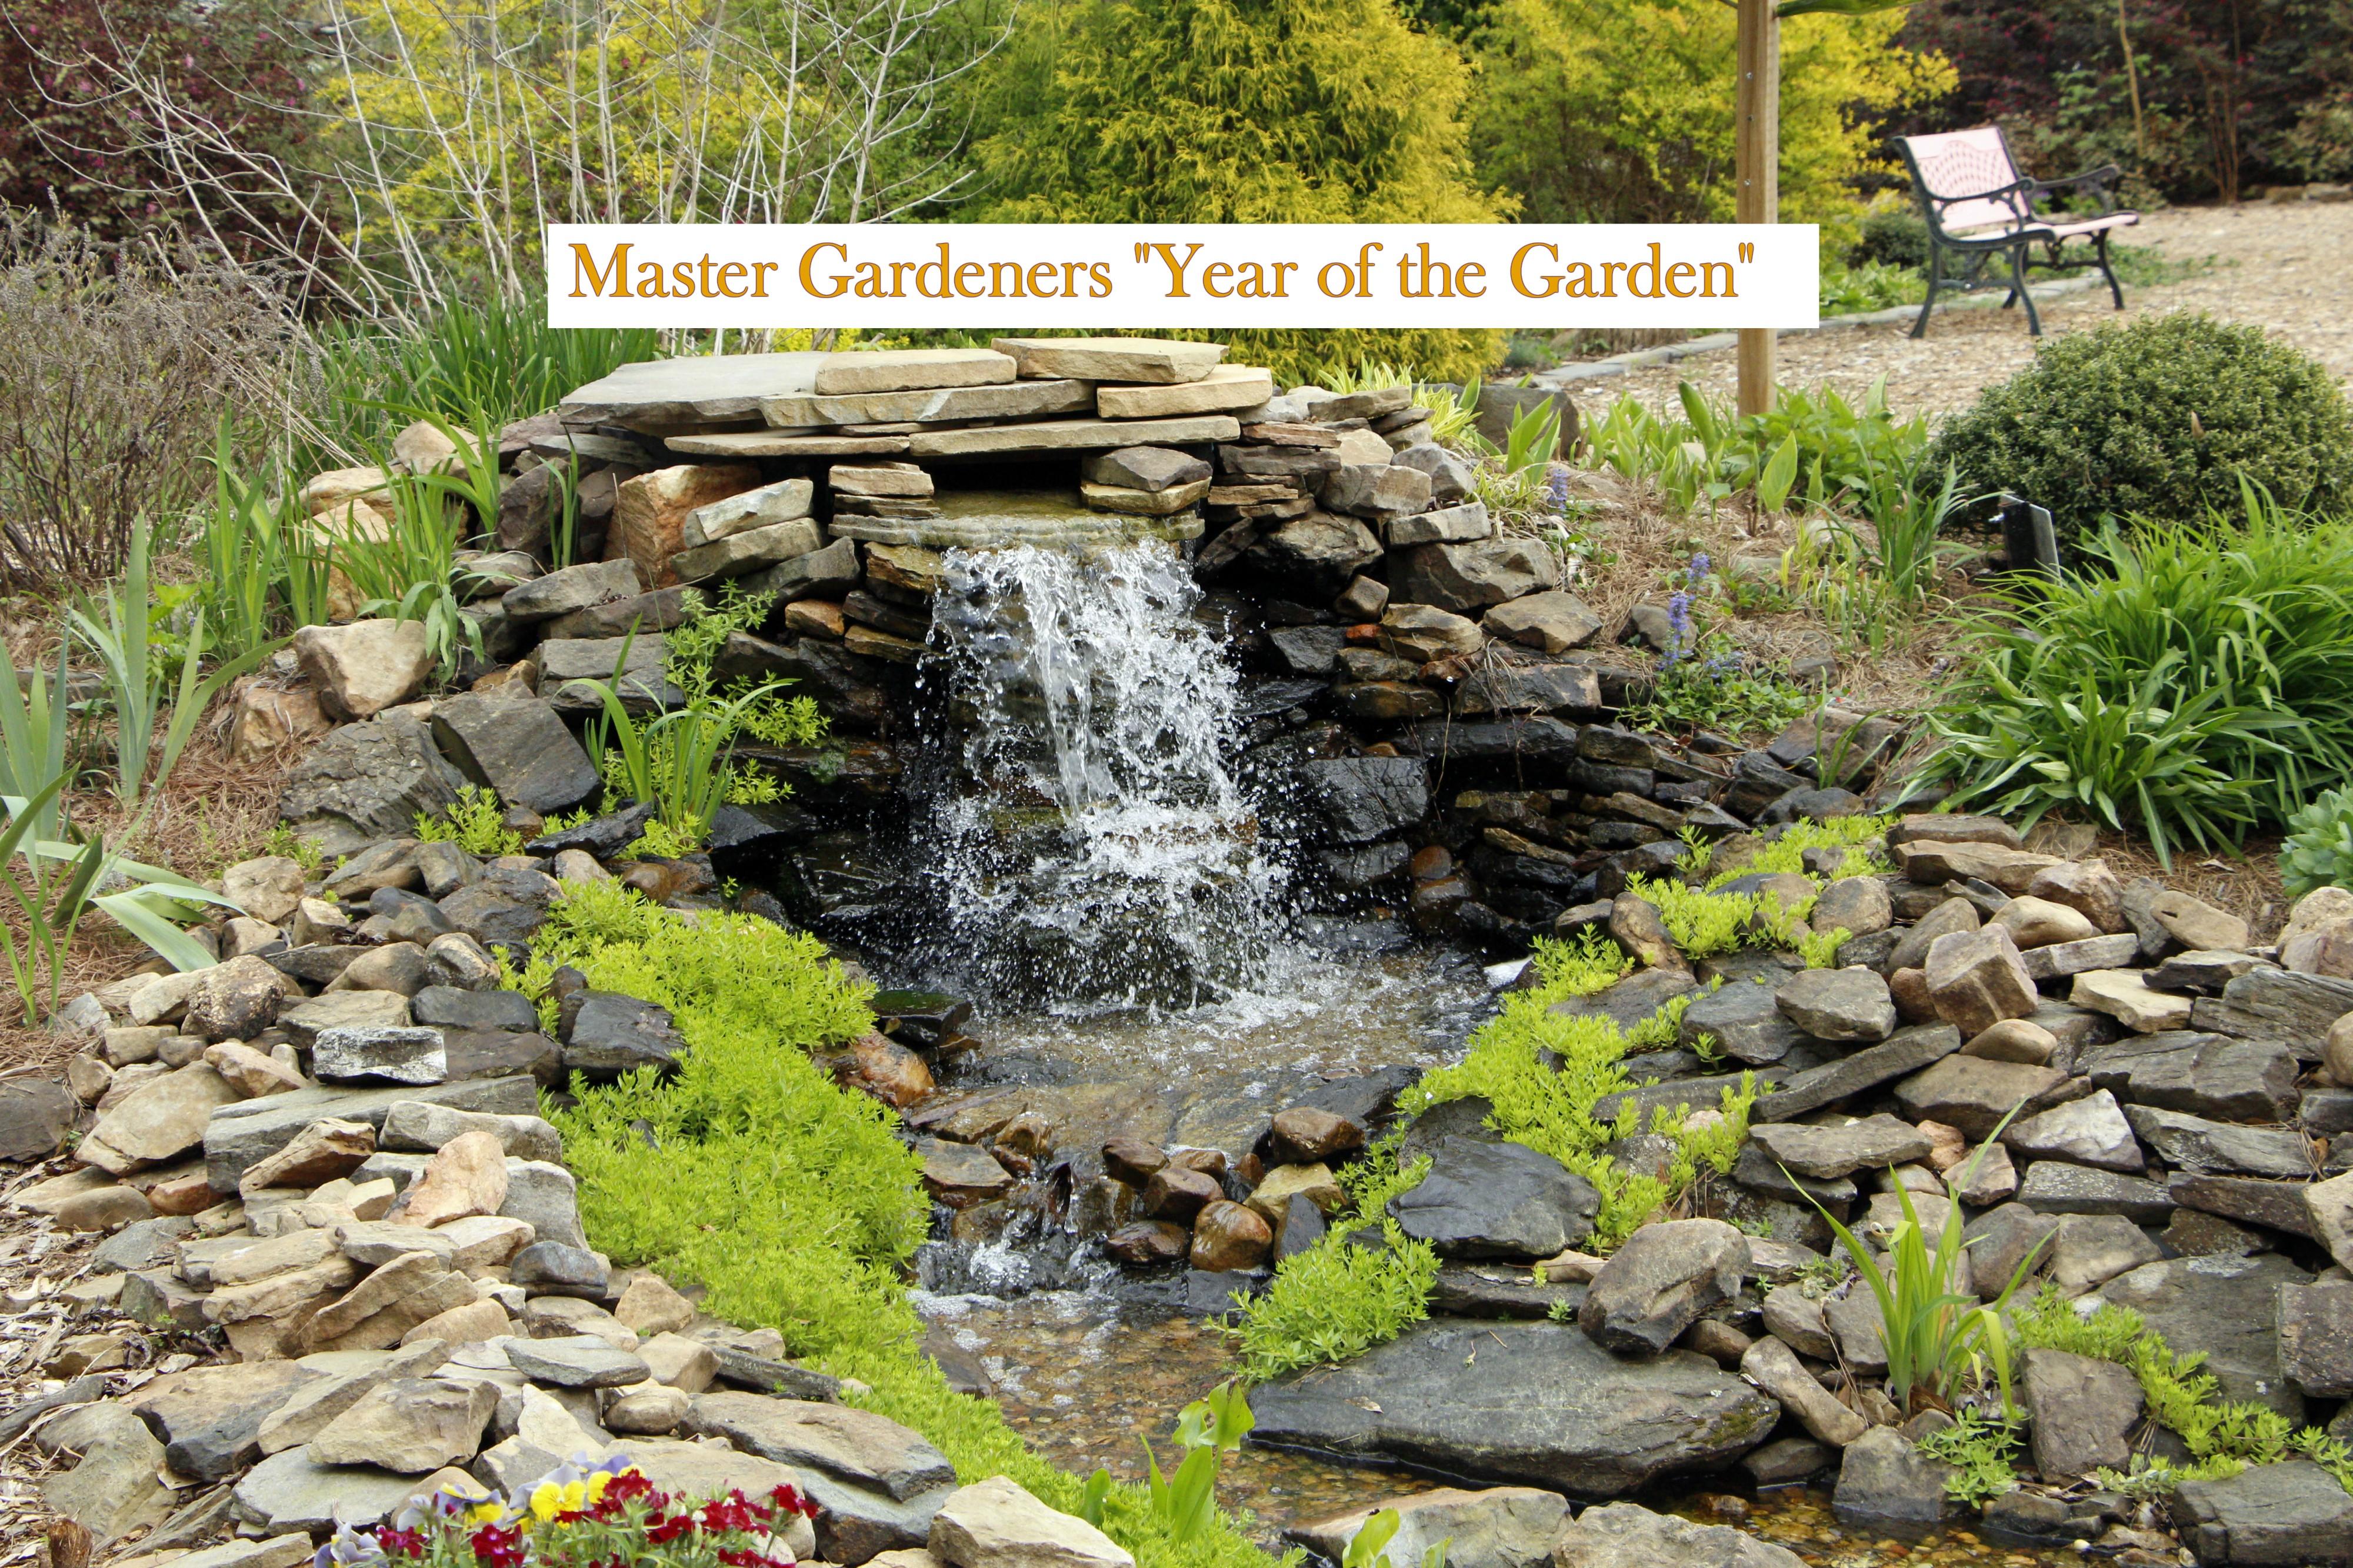 MasterGardnersTheYearoftheGarden-Waterfall-2017